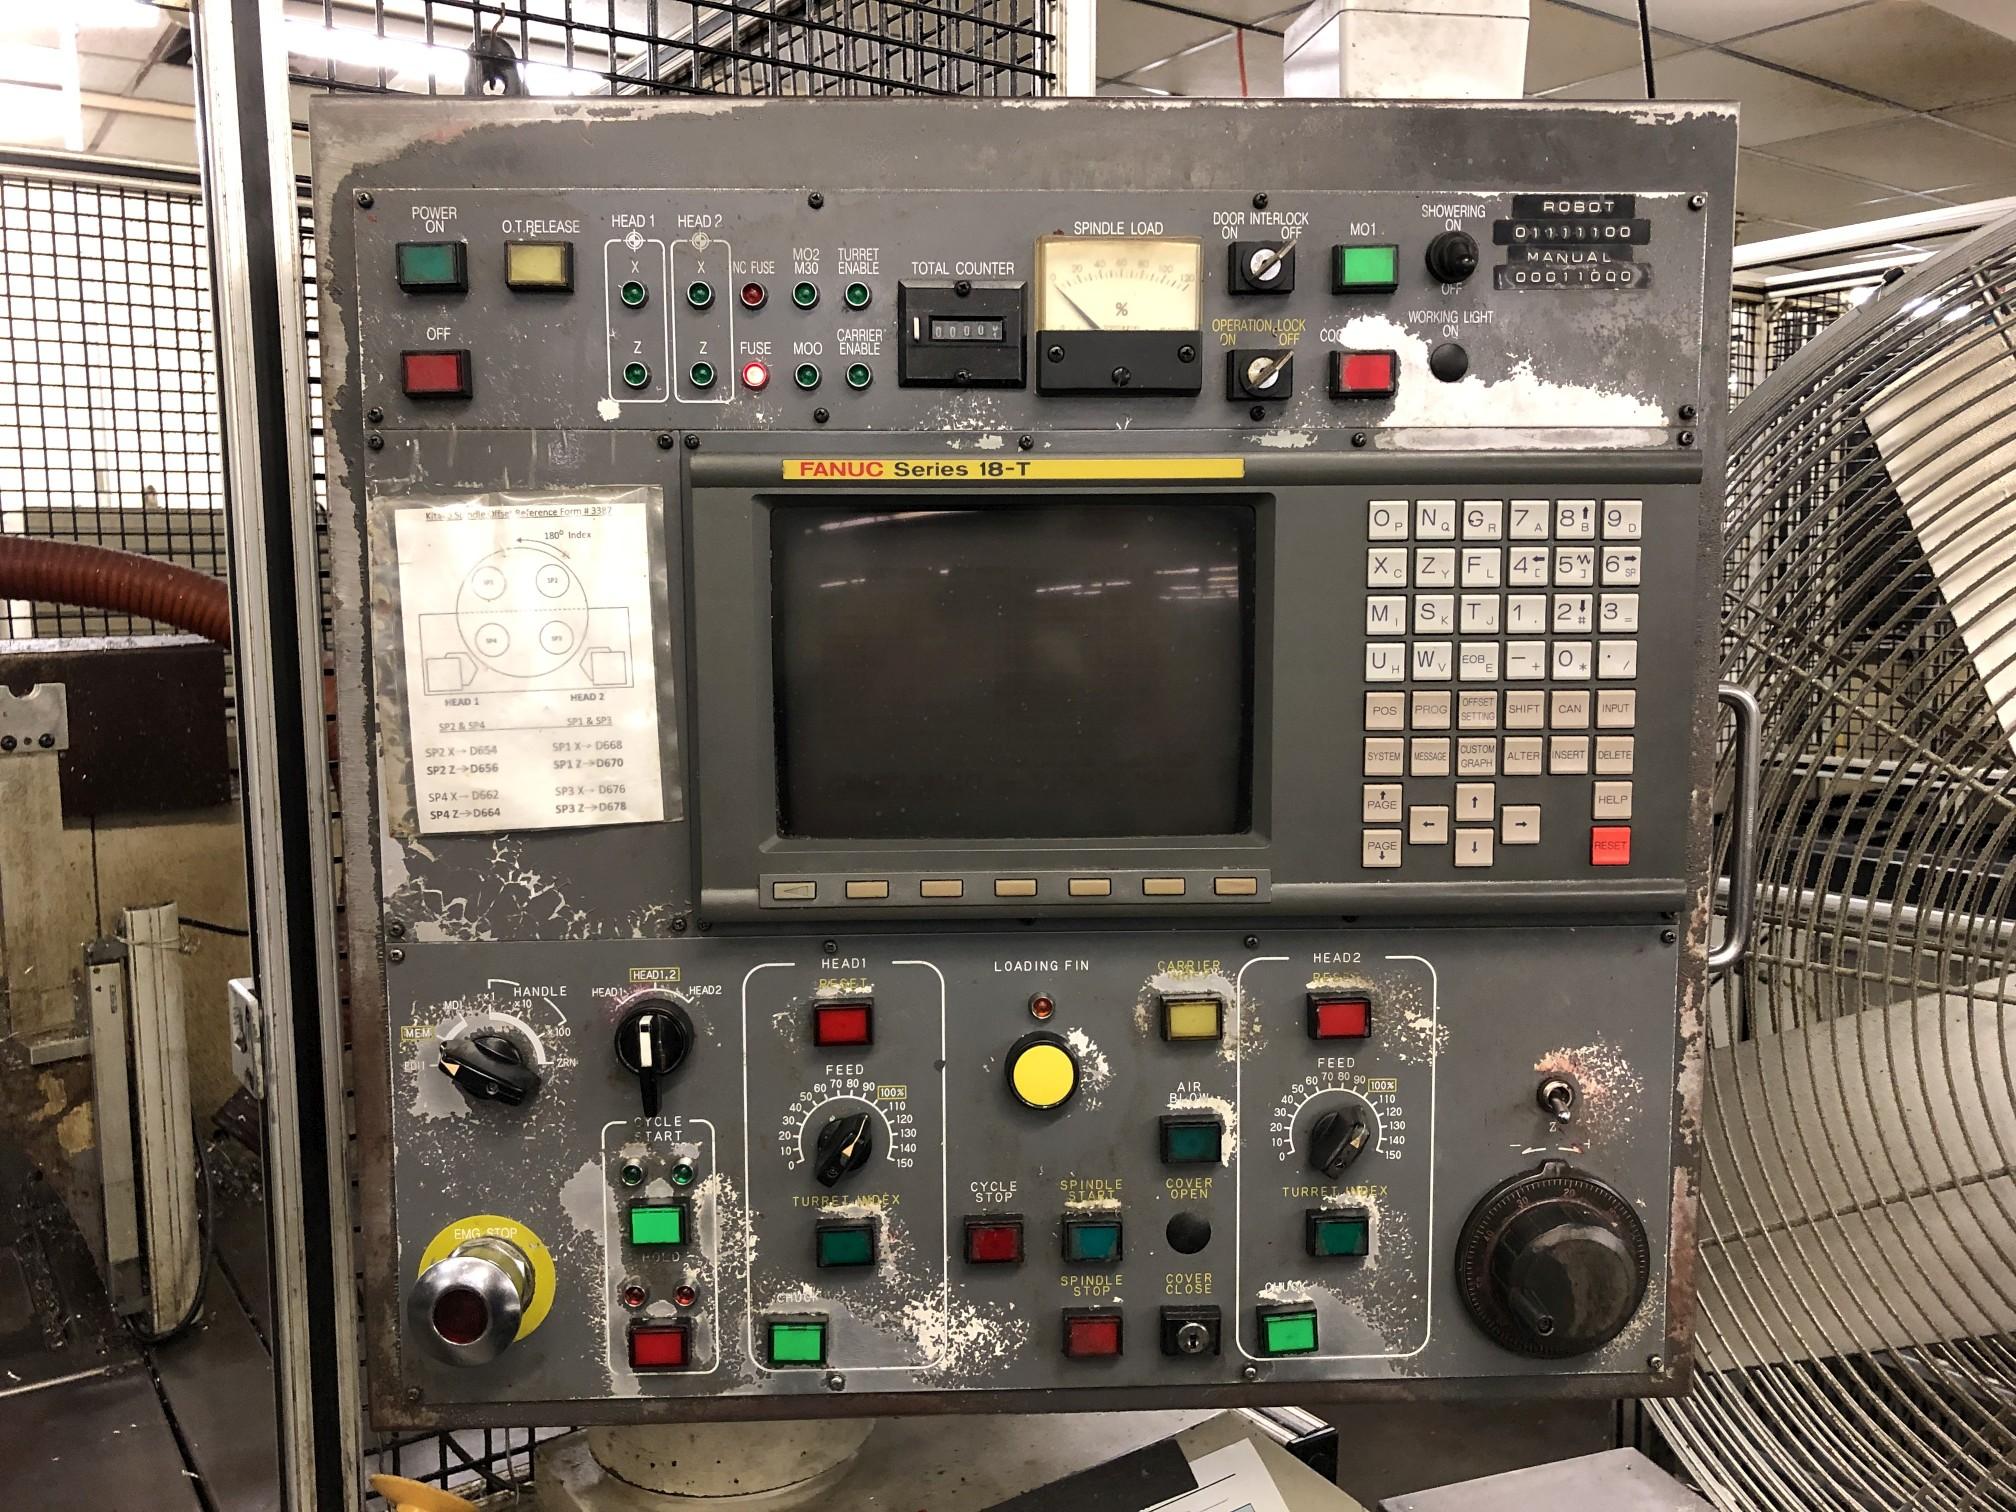 1999 Kitako MT4-200 Multi-Spindle CNC Turning Mill - Image 6 of 17